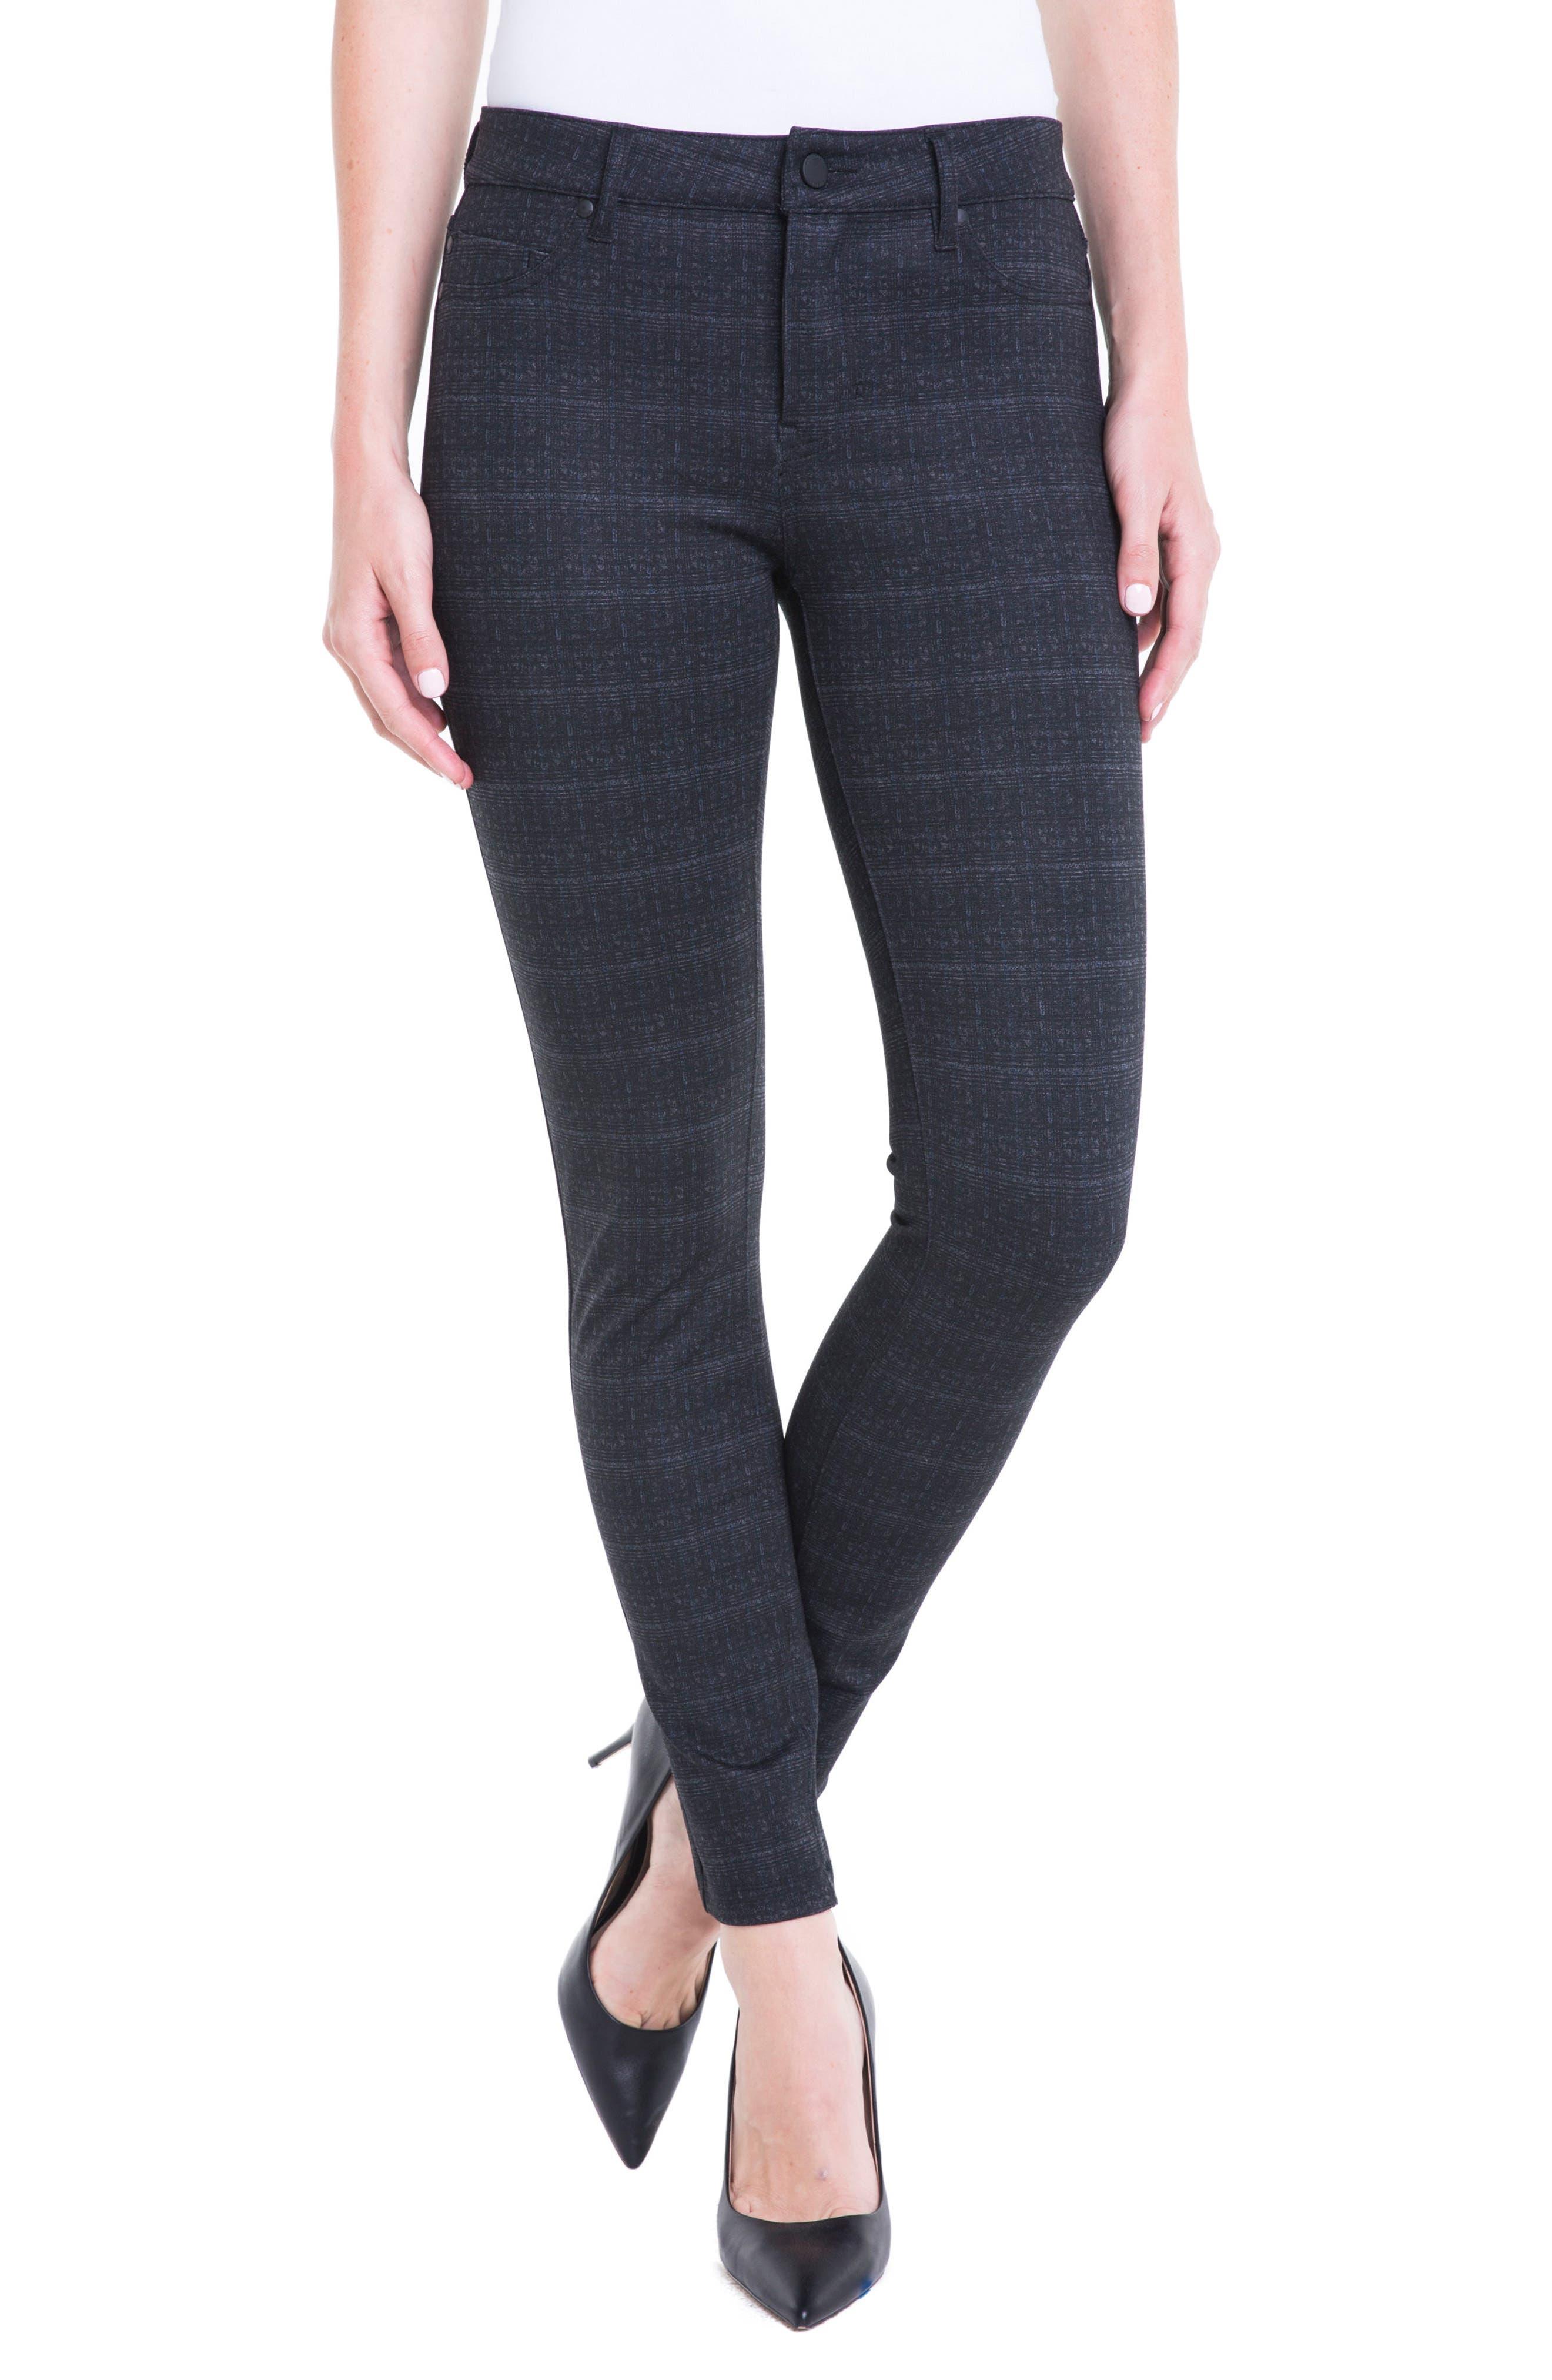 Plaid Super Skinny Ponte Knit Pants,                         Main,                         color, Charcoal Shadow Plaid